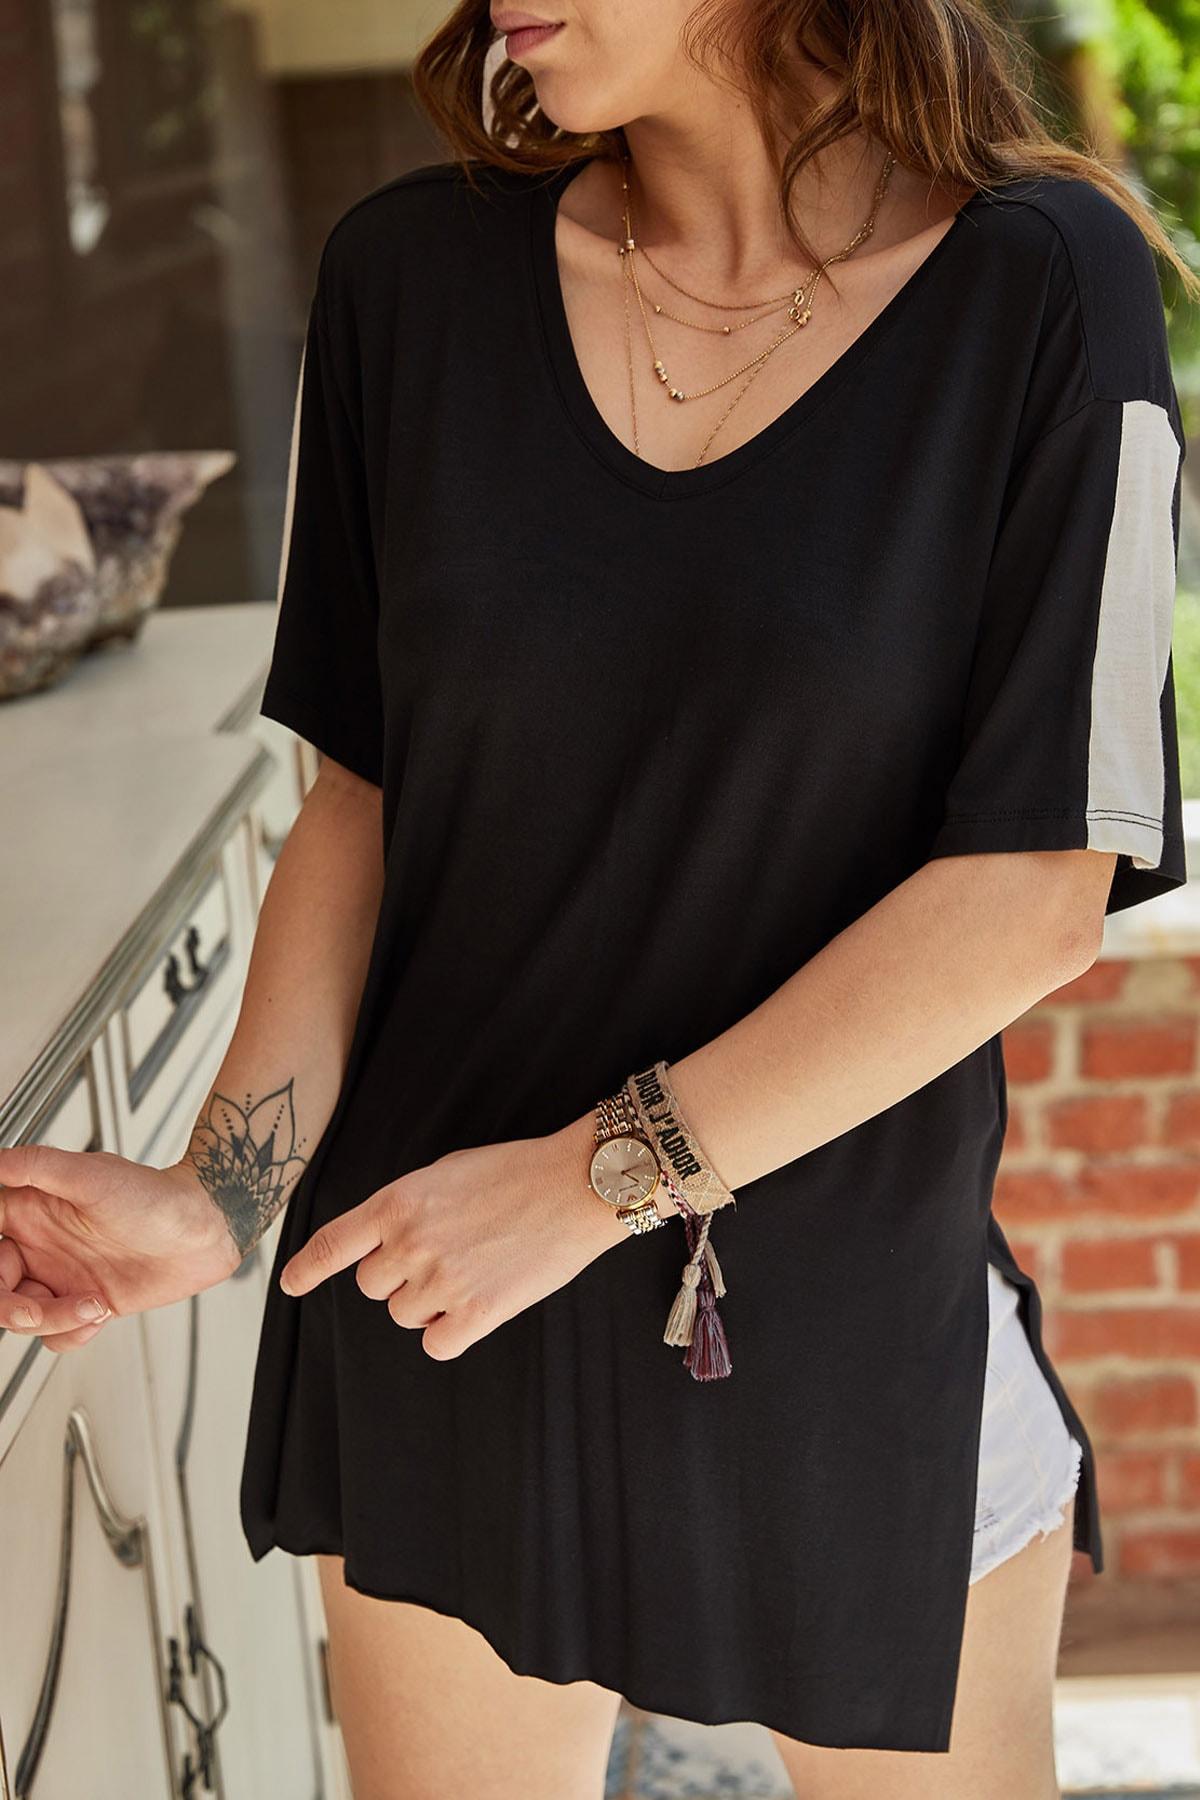 XHAN Kadın Siyah Yırtmaç Detaylı T-Shirt 9YXK2-41434-02 1